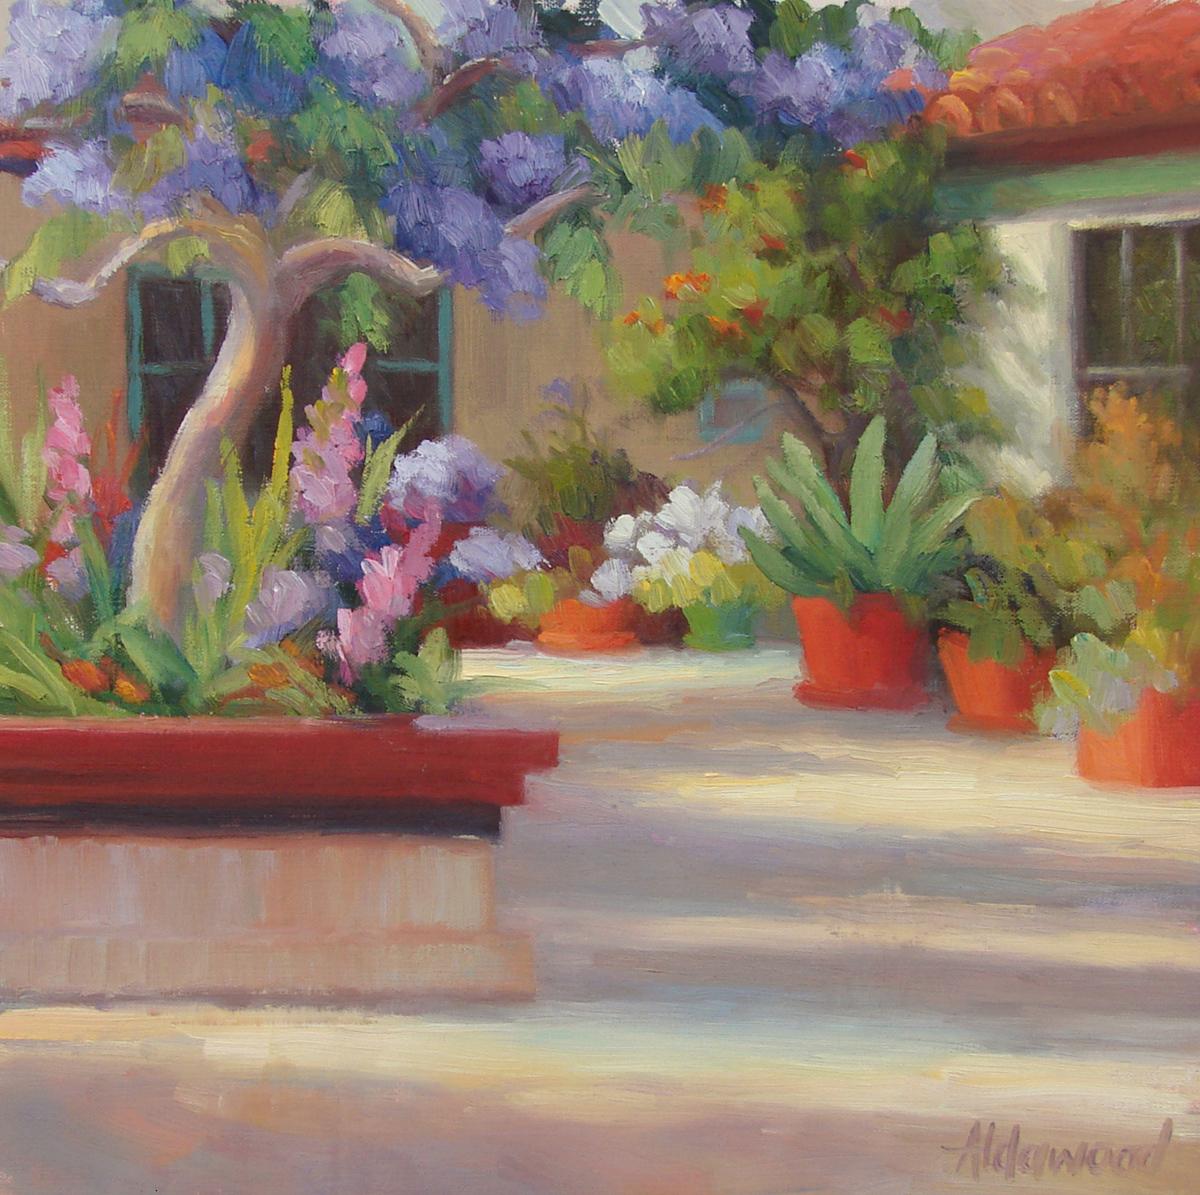 """San Diego Color"" original fine art by Sherri Aldawood"